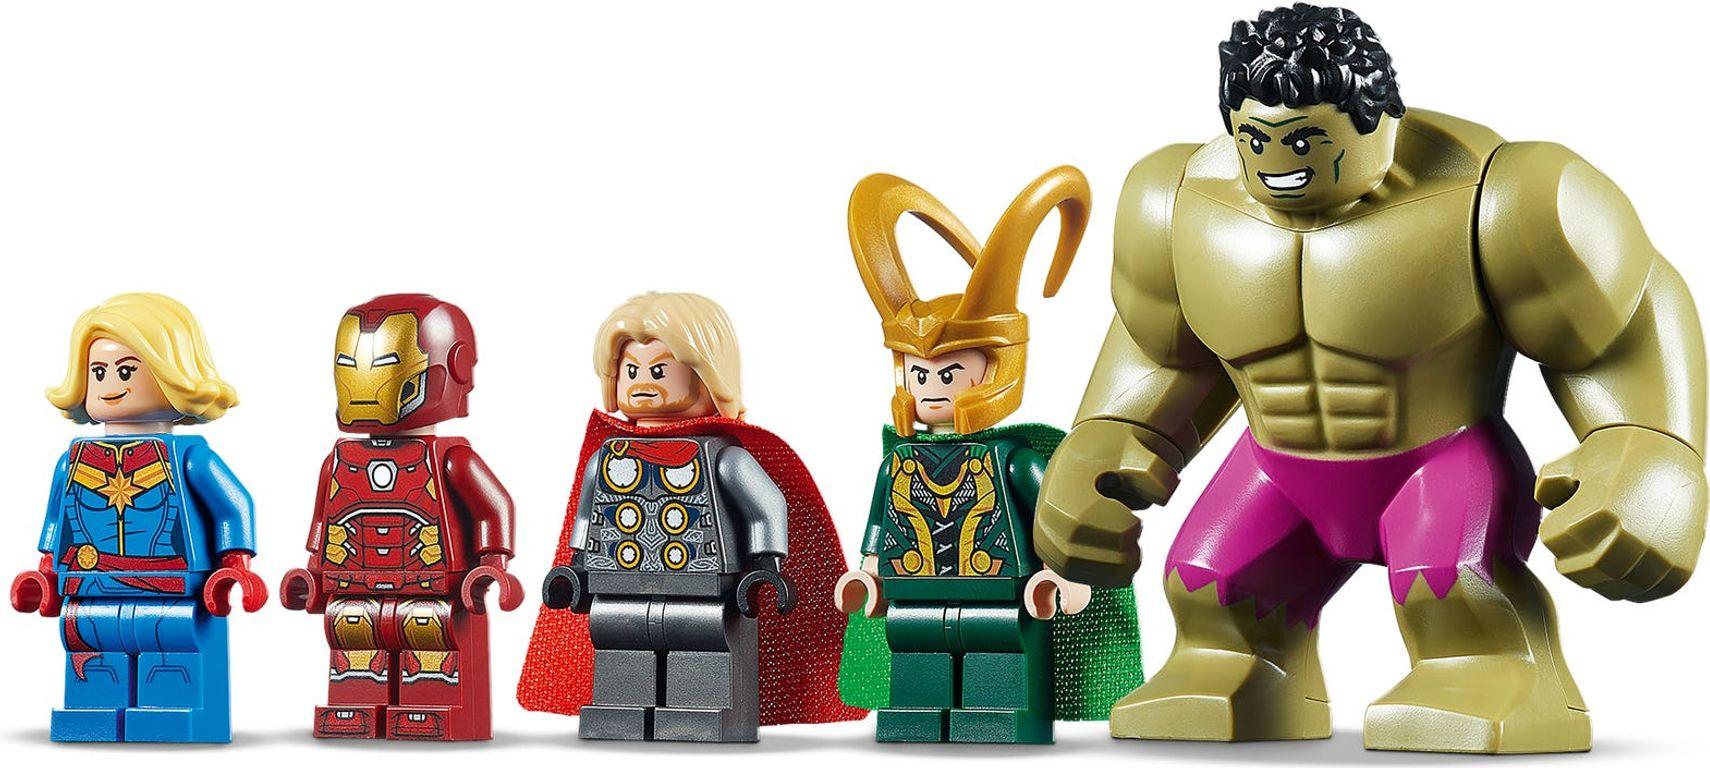 Avengers Wrath of Loki minifigures